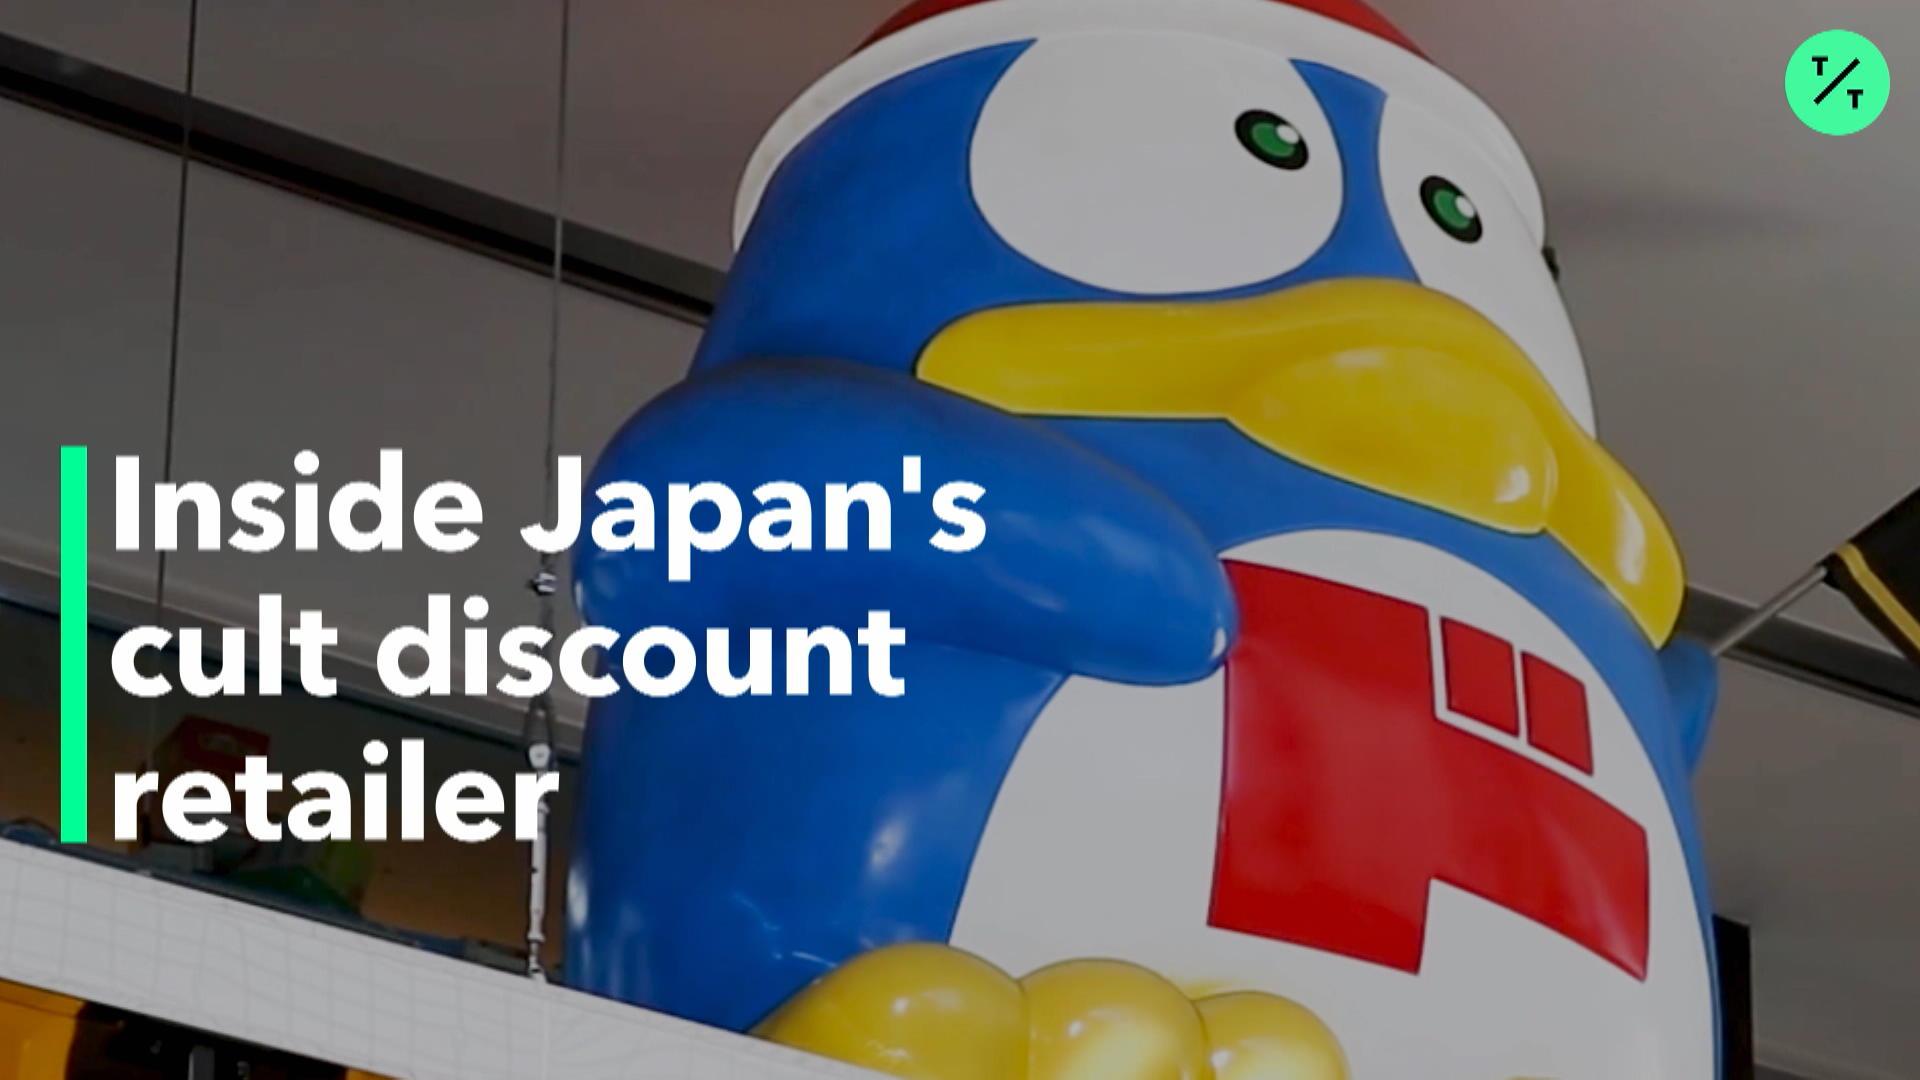 Inside Japan's Cult Discount Retailer